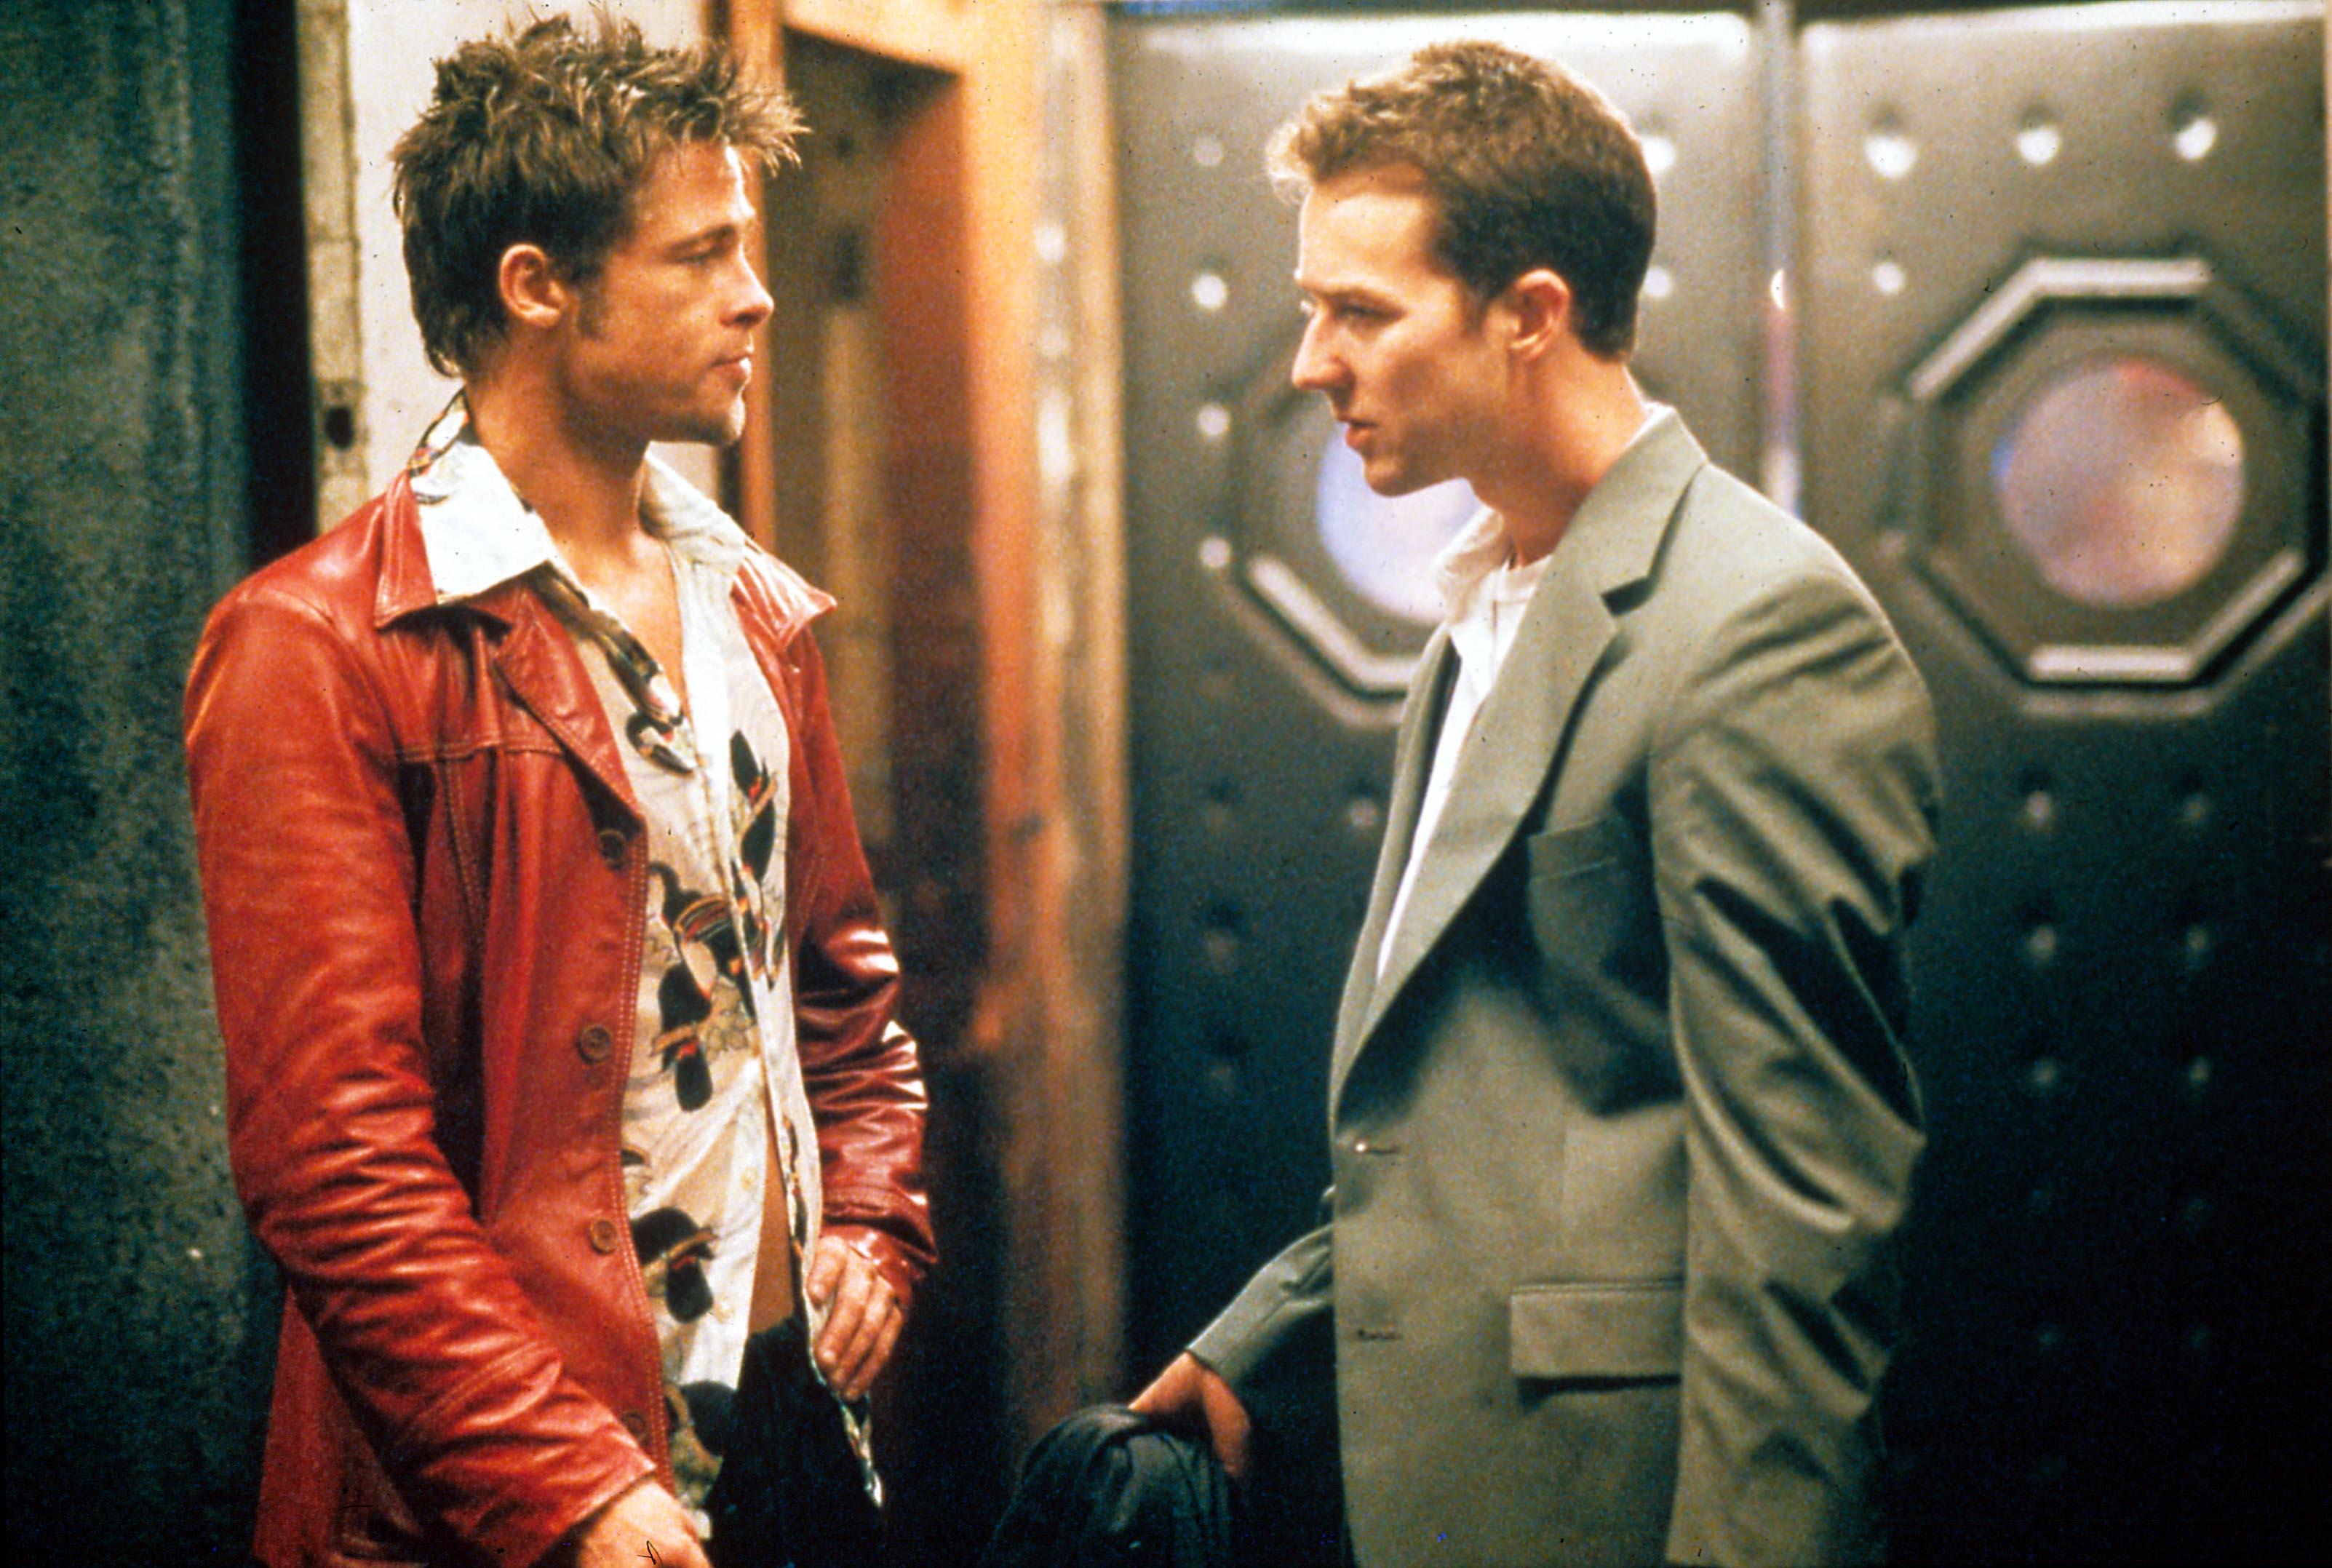 Edward Norton Blames Studio's 'Reluctance' for 'Fight Club' Box-Office Failure